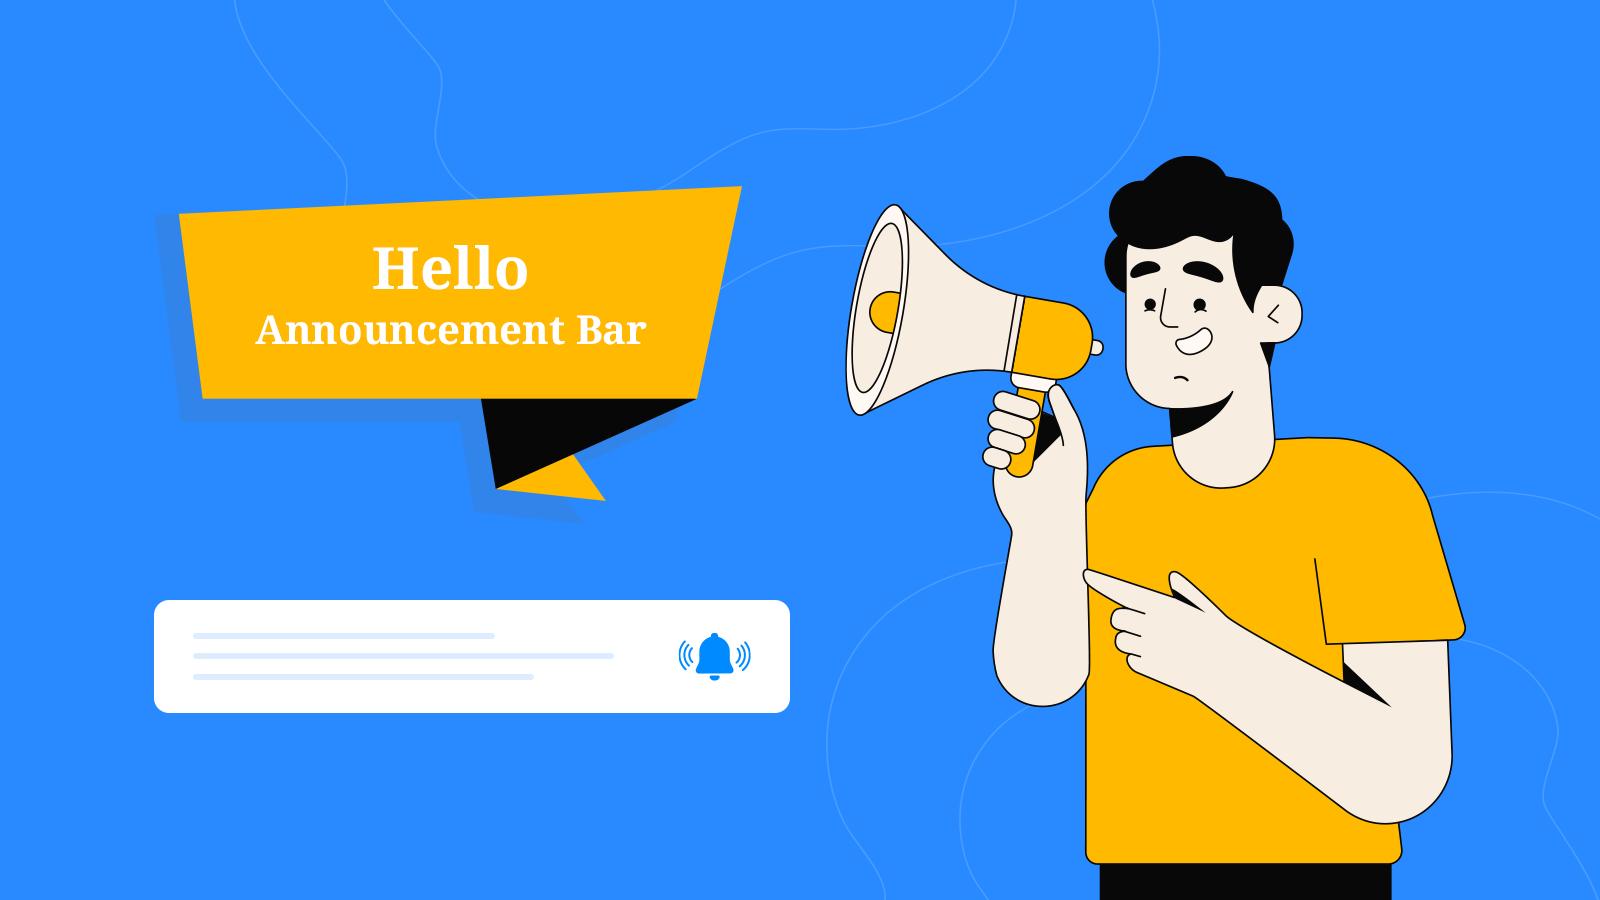 Hello Announcement Bar